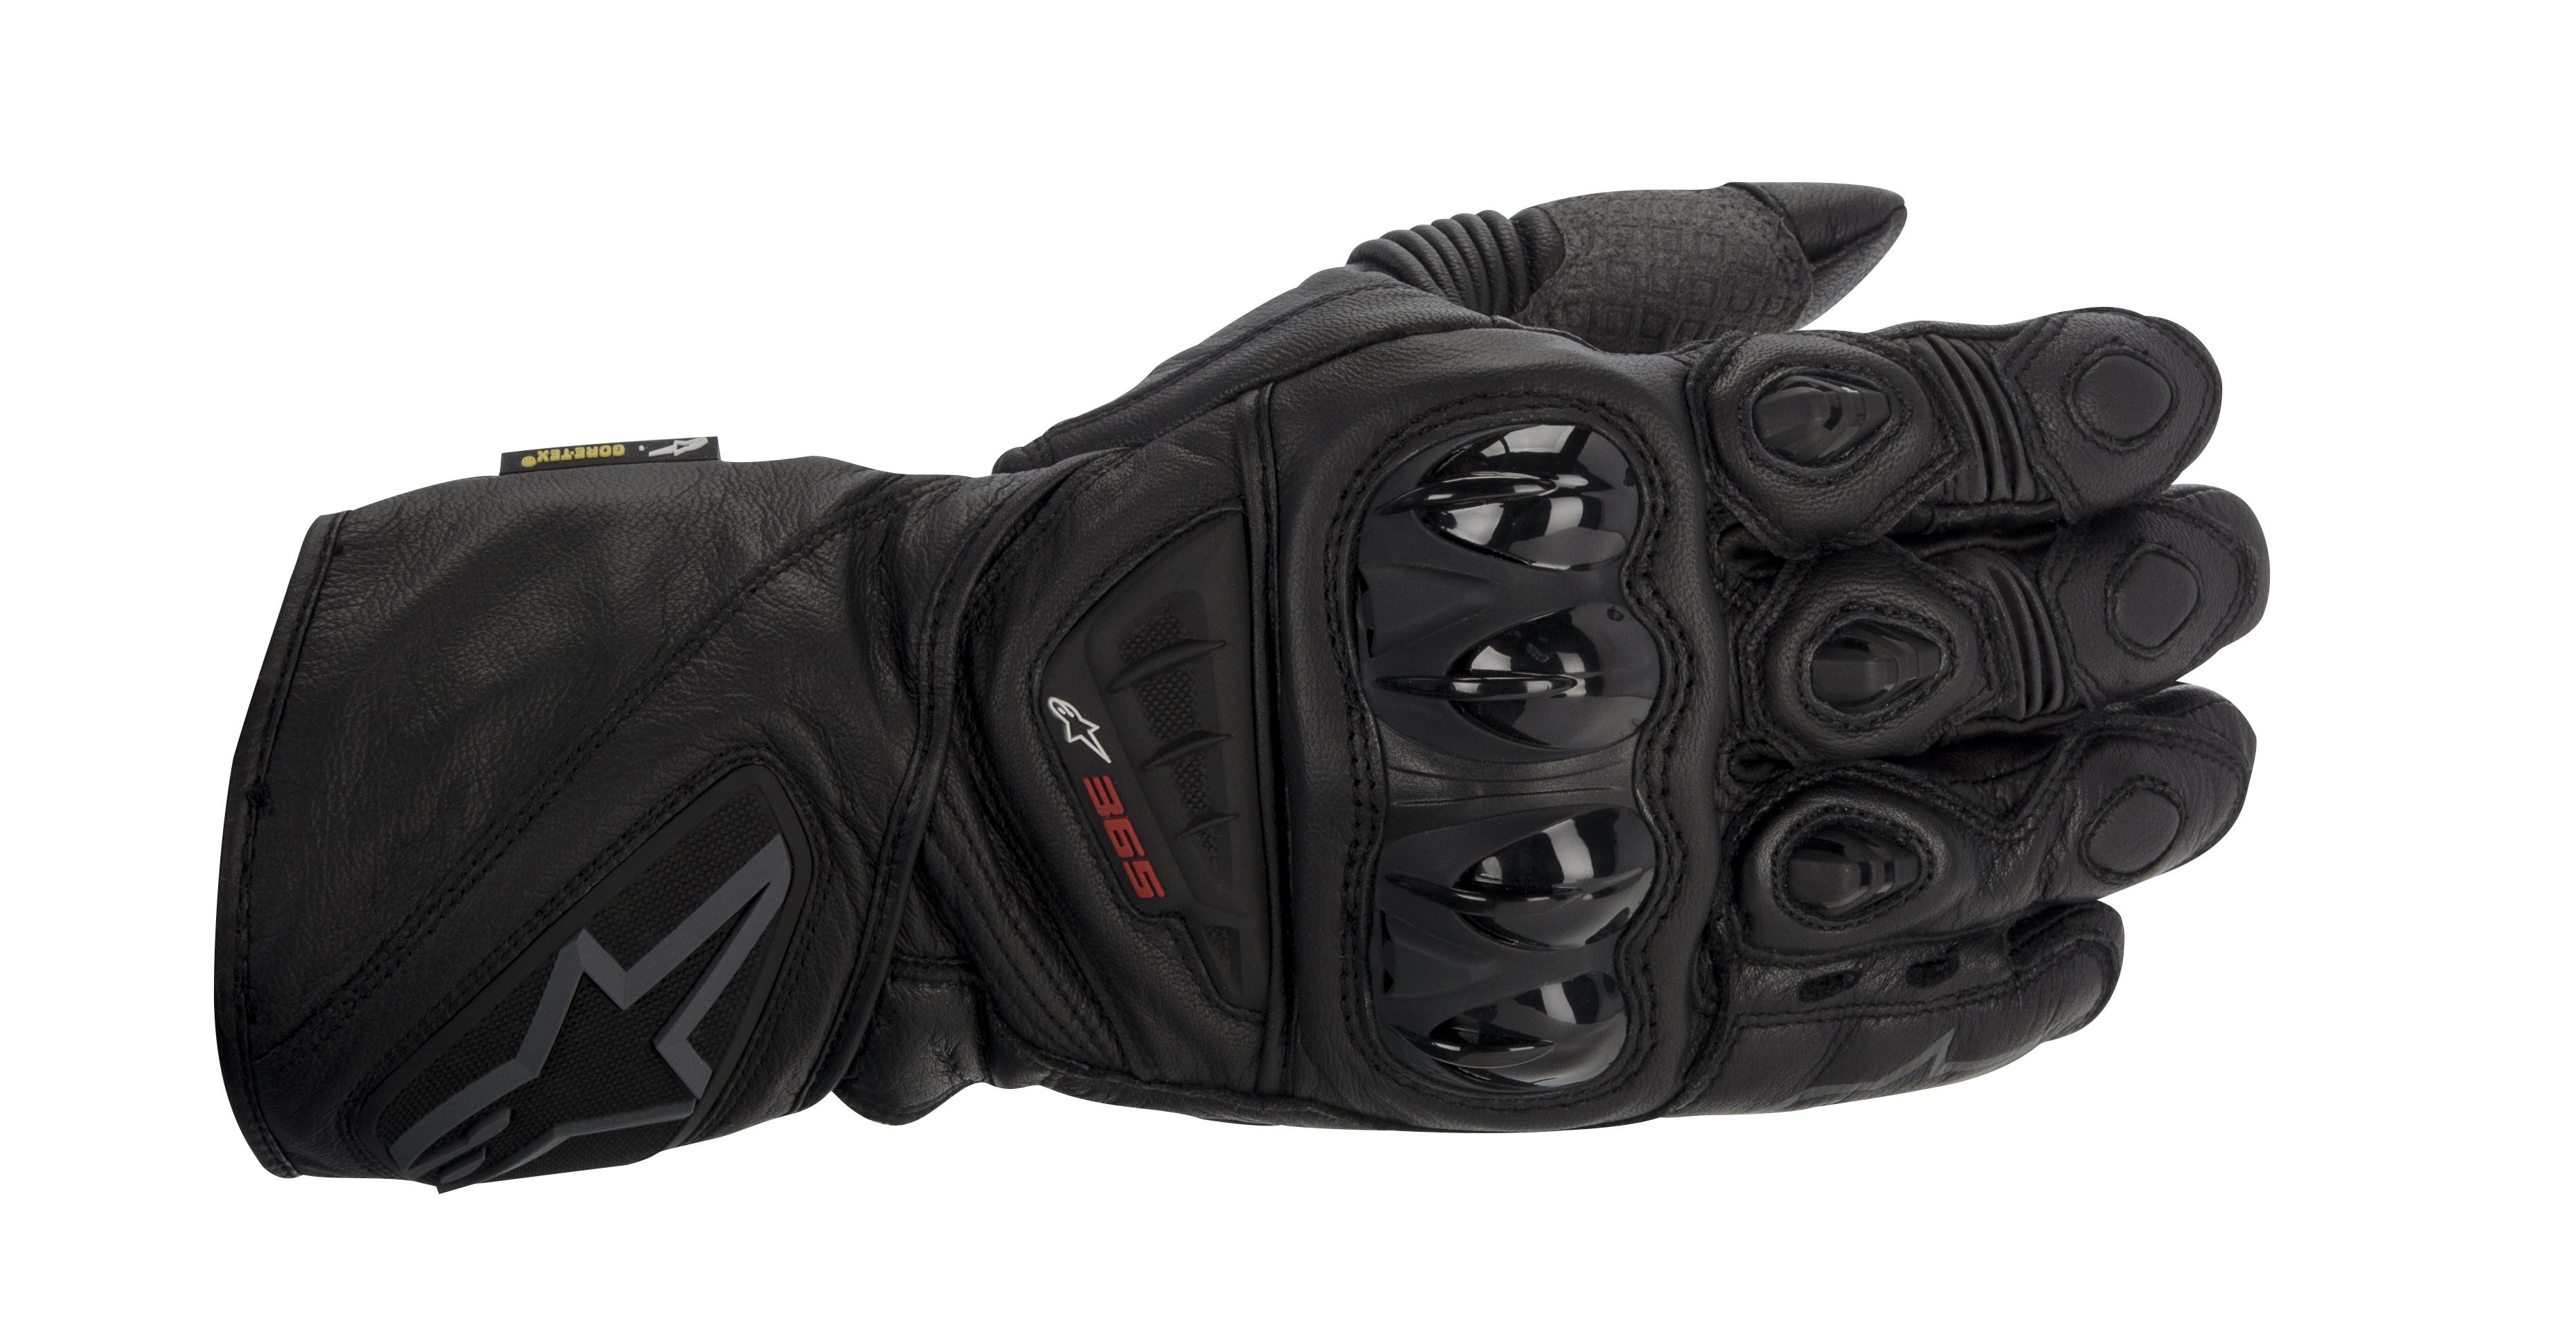 Xtrafit motorcycle gloves - New Alpinestars 365 X Trafit Gloves